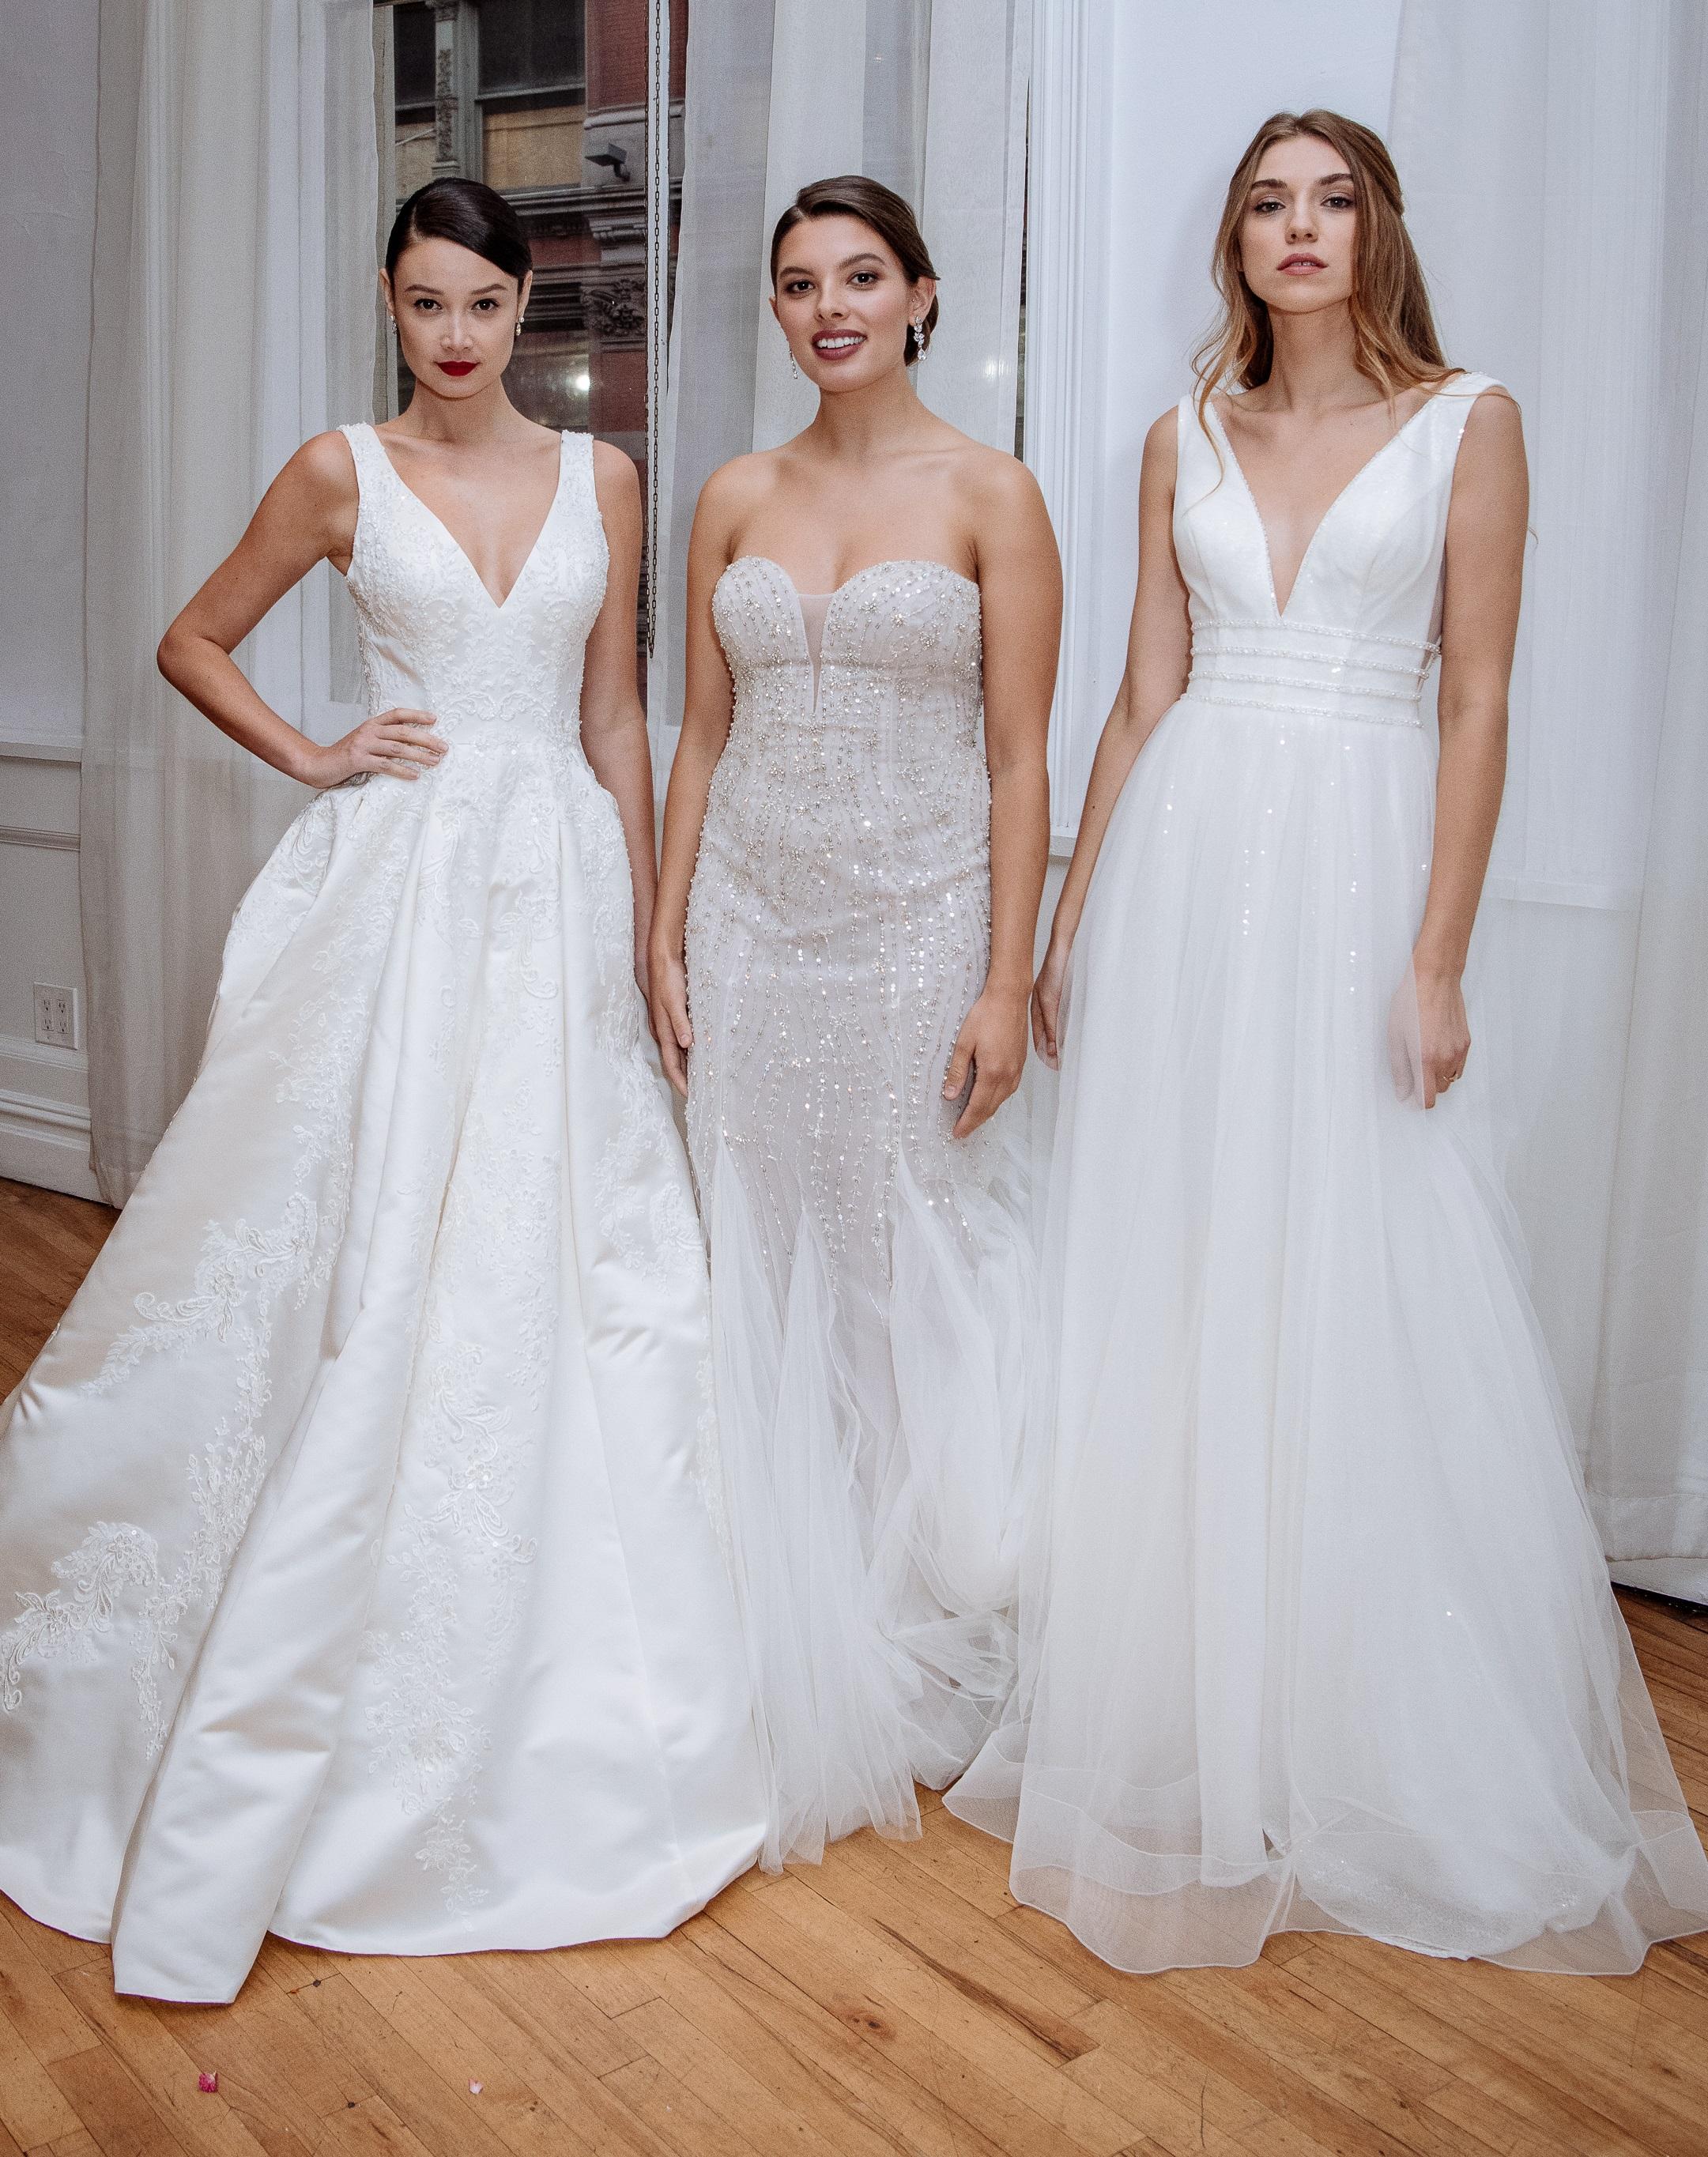 2019 Spring Wedding Dresses | Sparkle Wedding Dresses